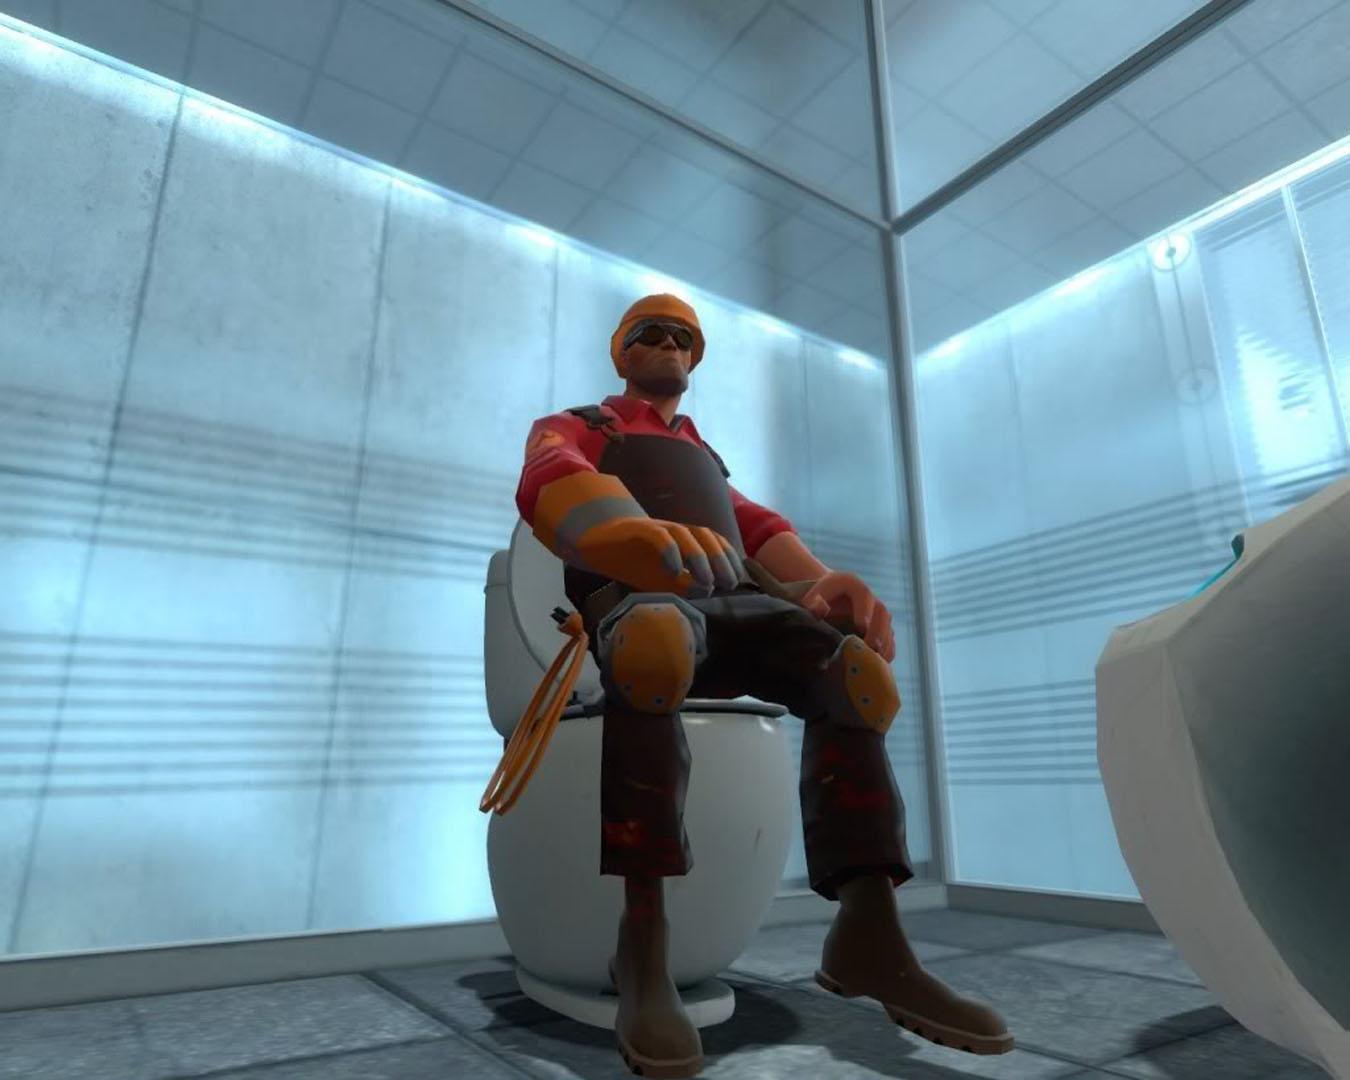 Engineer On The Toilet